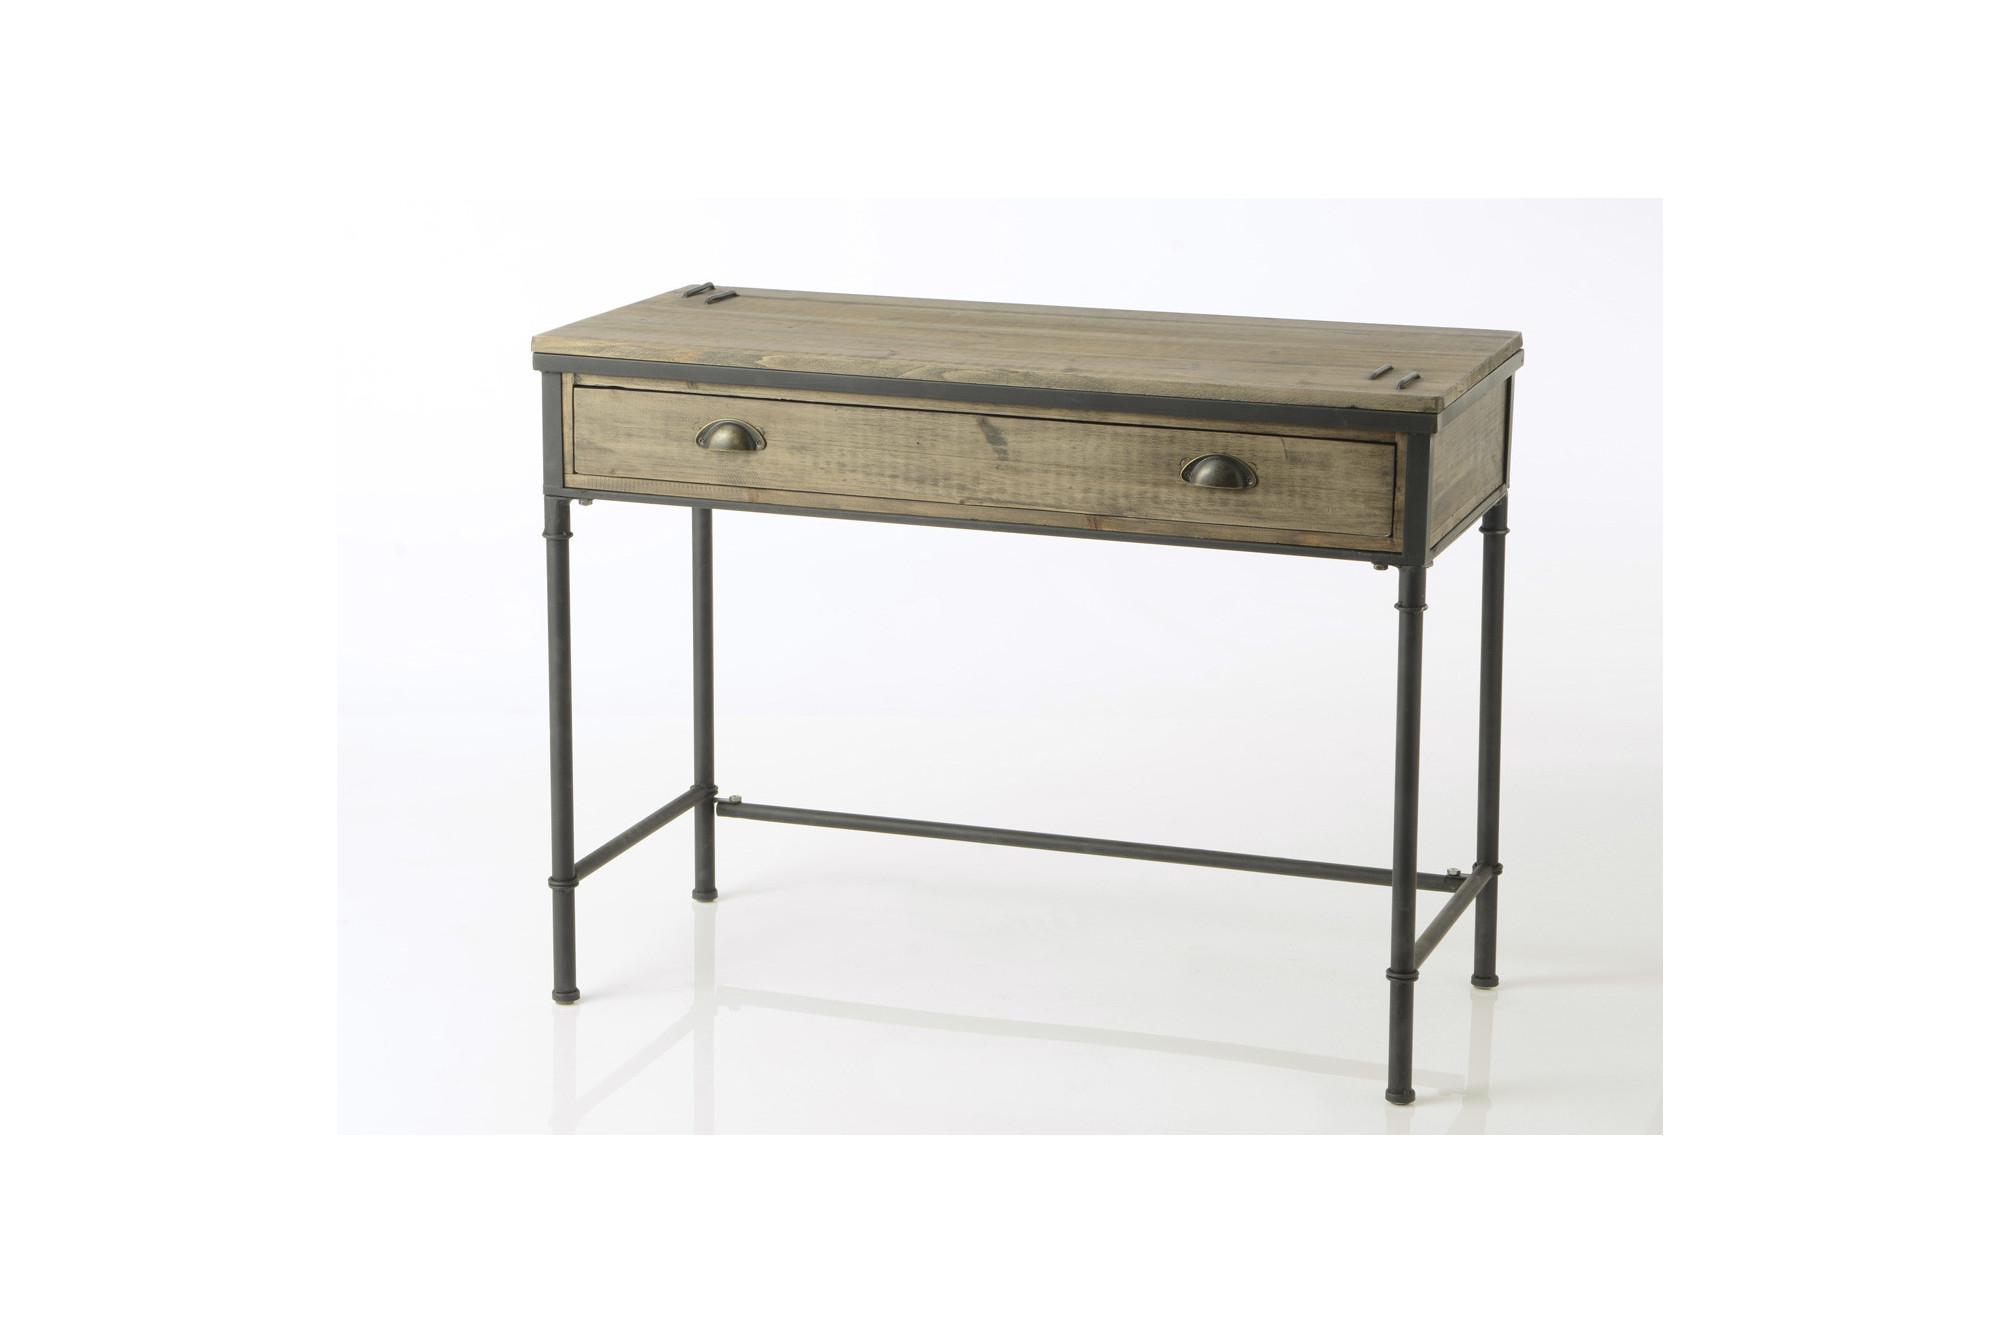 Bureau en bois et métal agar hellin